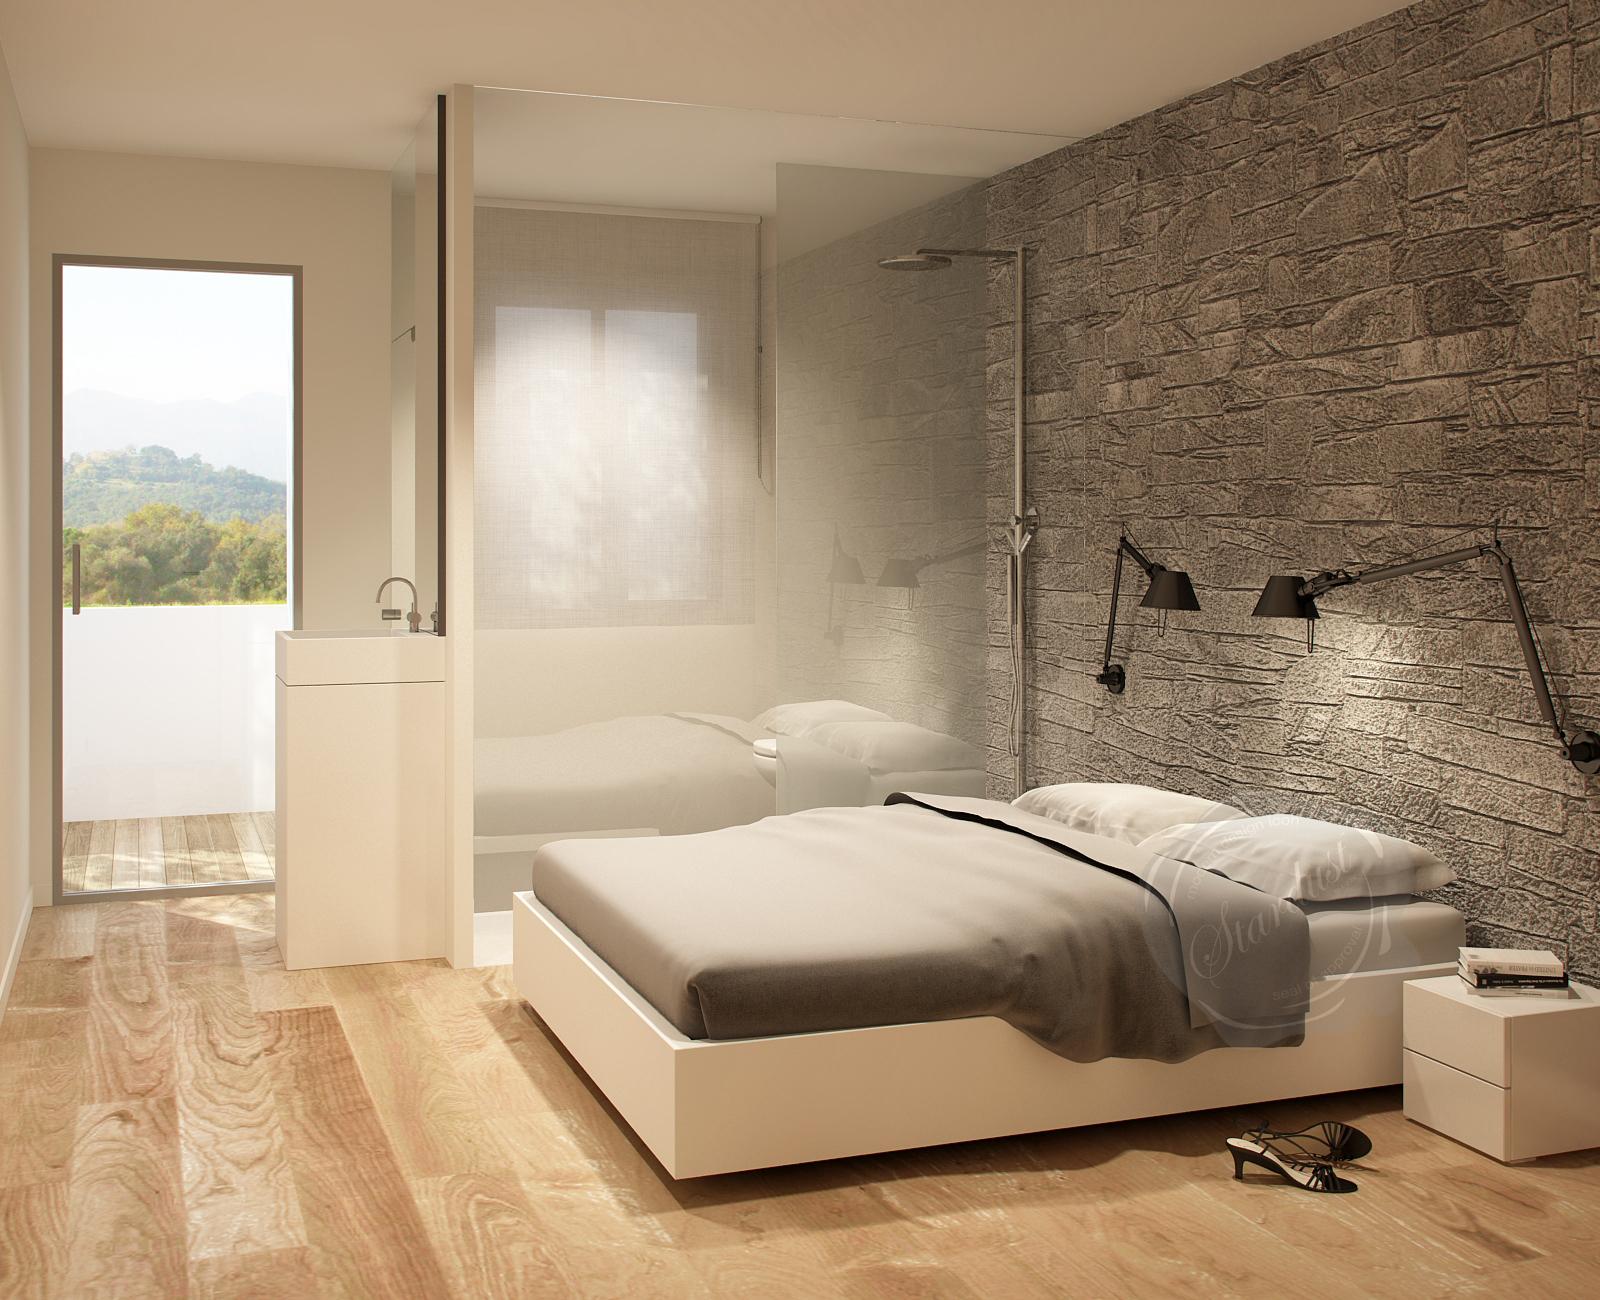 Illuminazione Ingresso Appartamento : Forum arredamento u impianto elettrico ed illuminazione appartamento